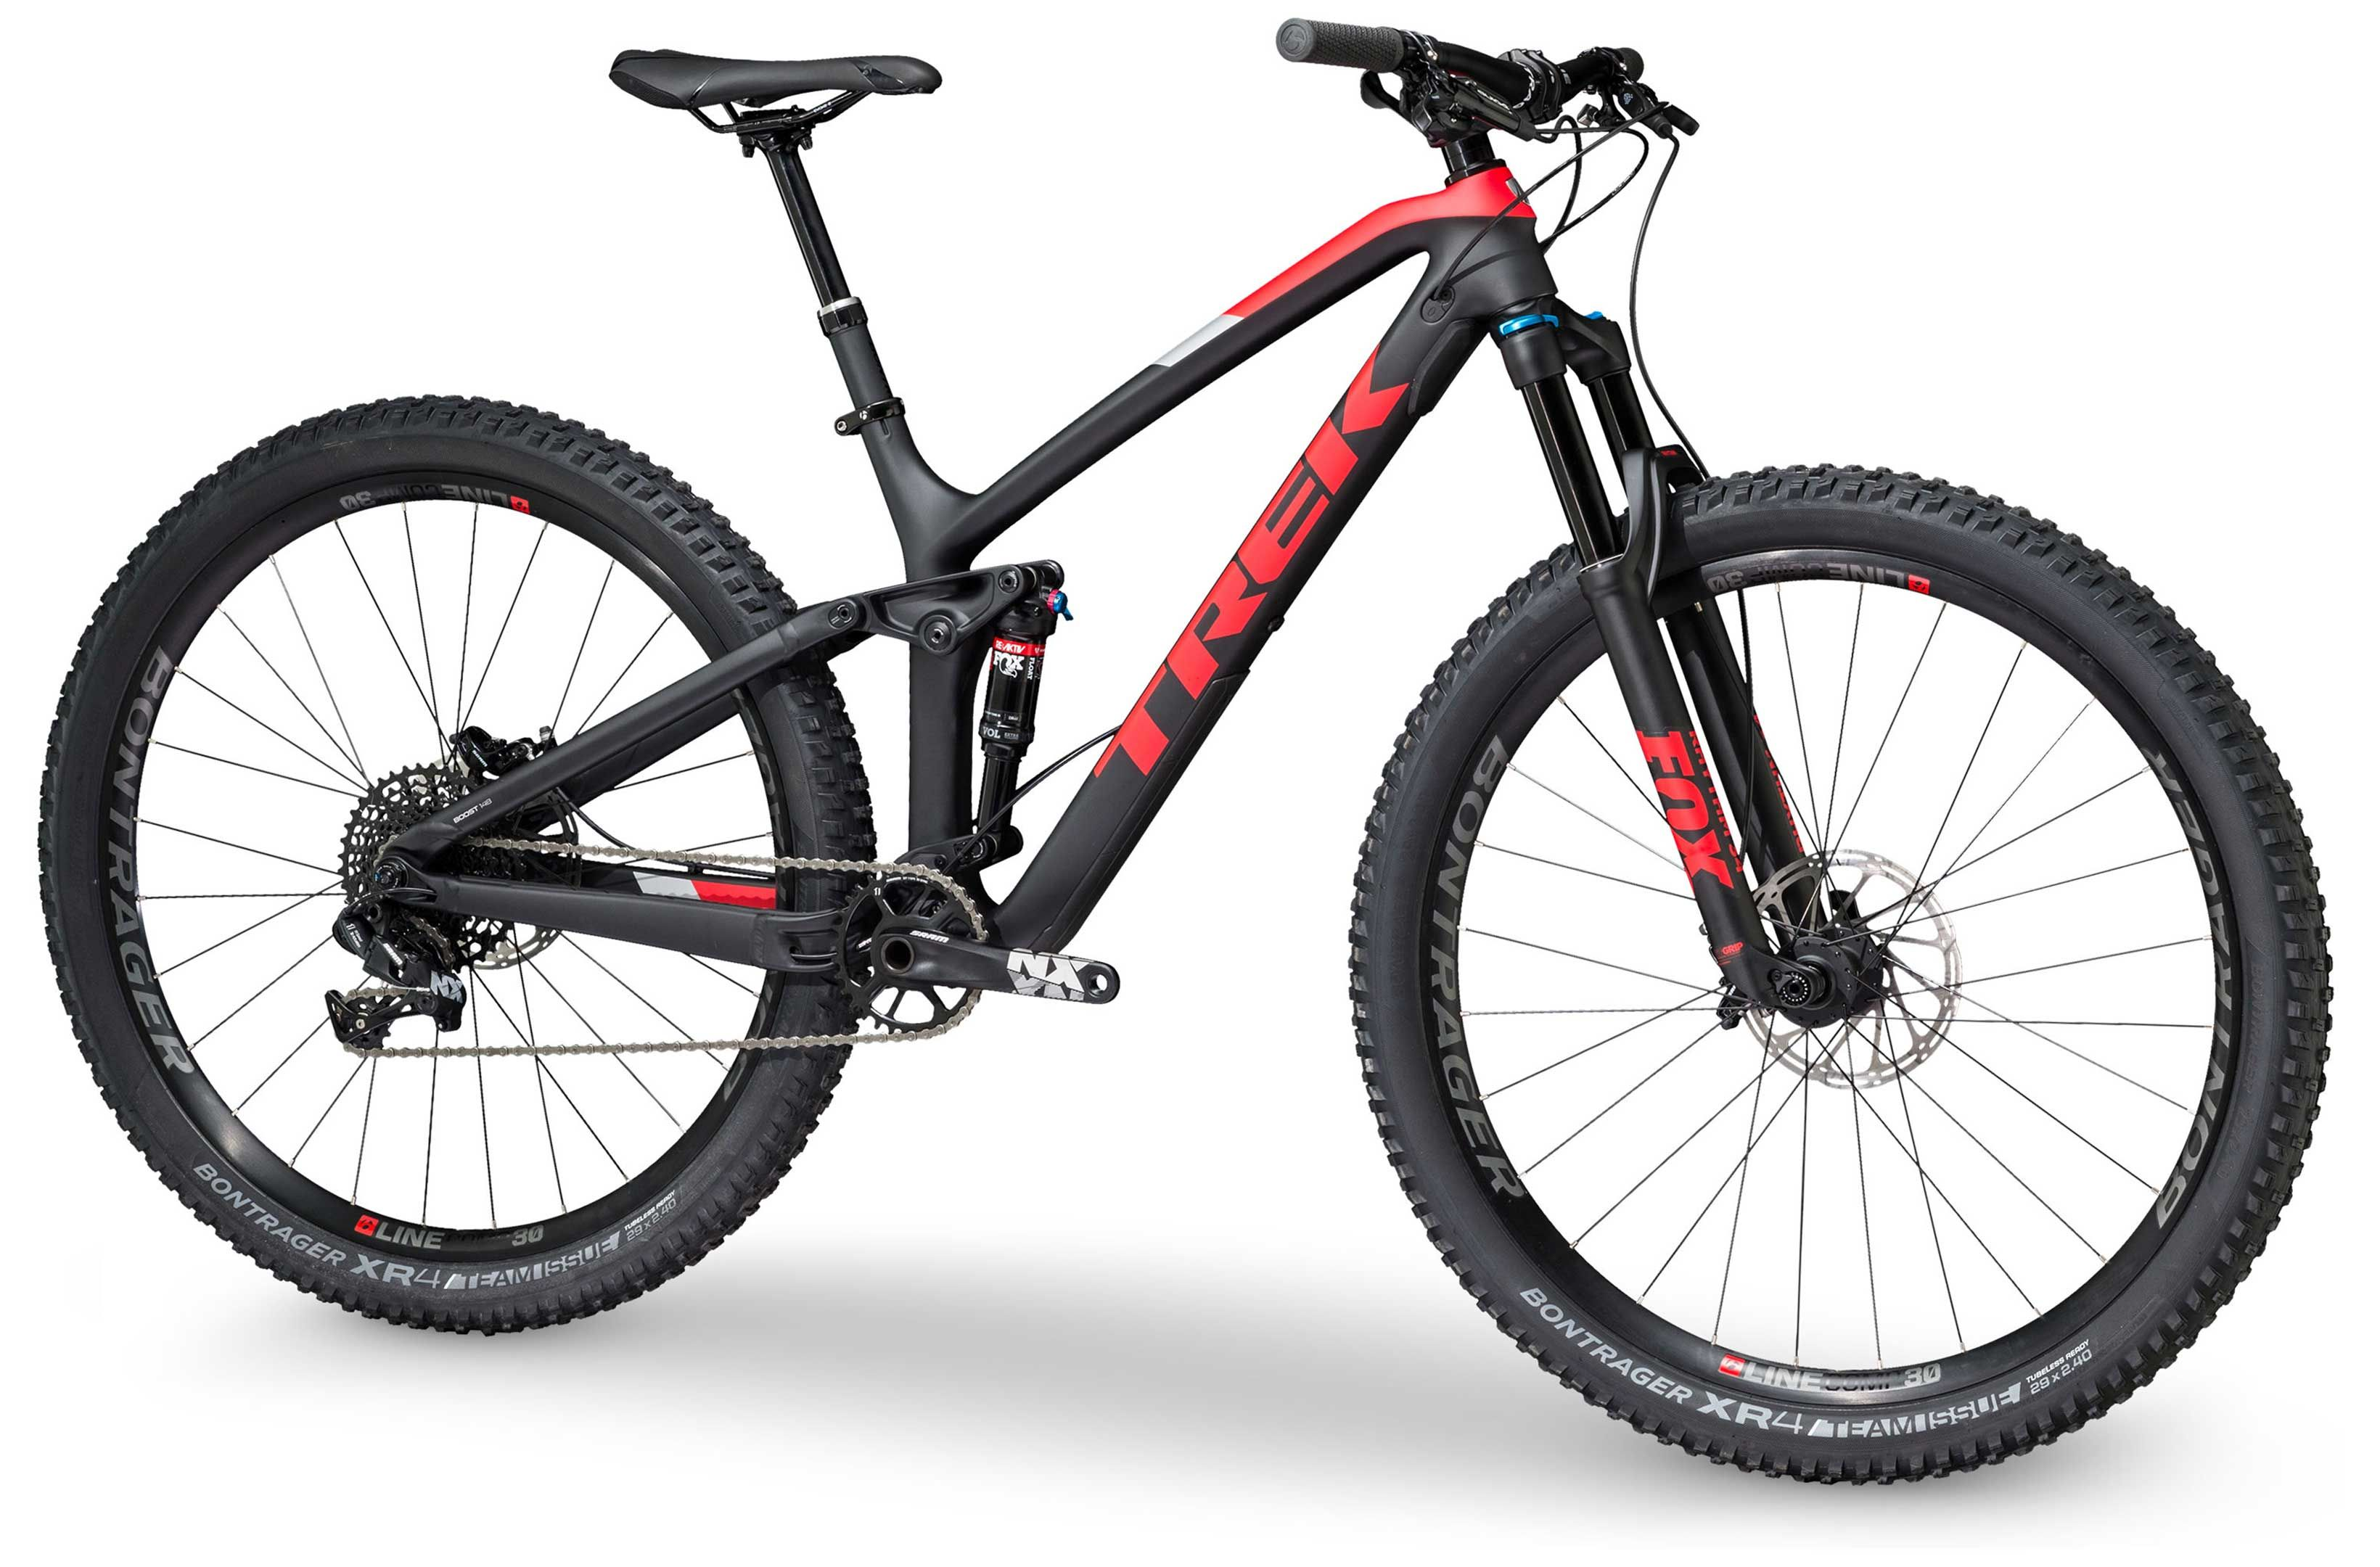 Trek Fuel Ex 9 7 2018 Mountain Bike Mountain Bikes Evans Cycles Bicycle Trek Mountain Bike Bike